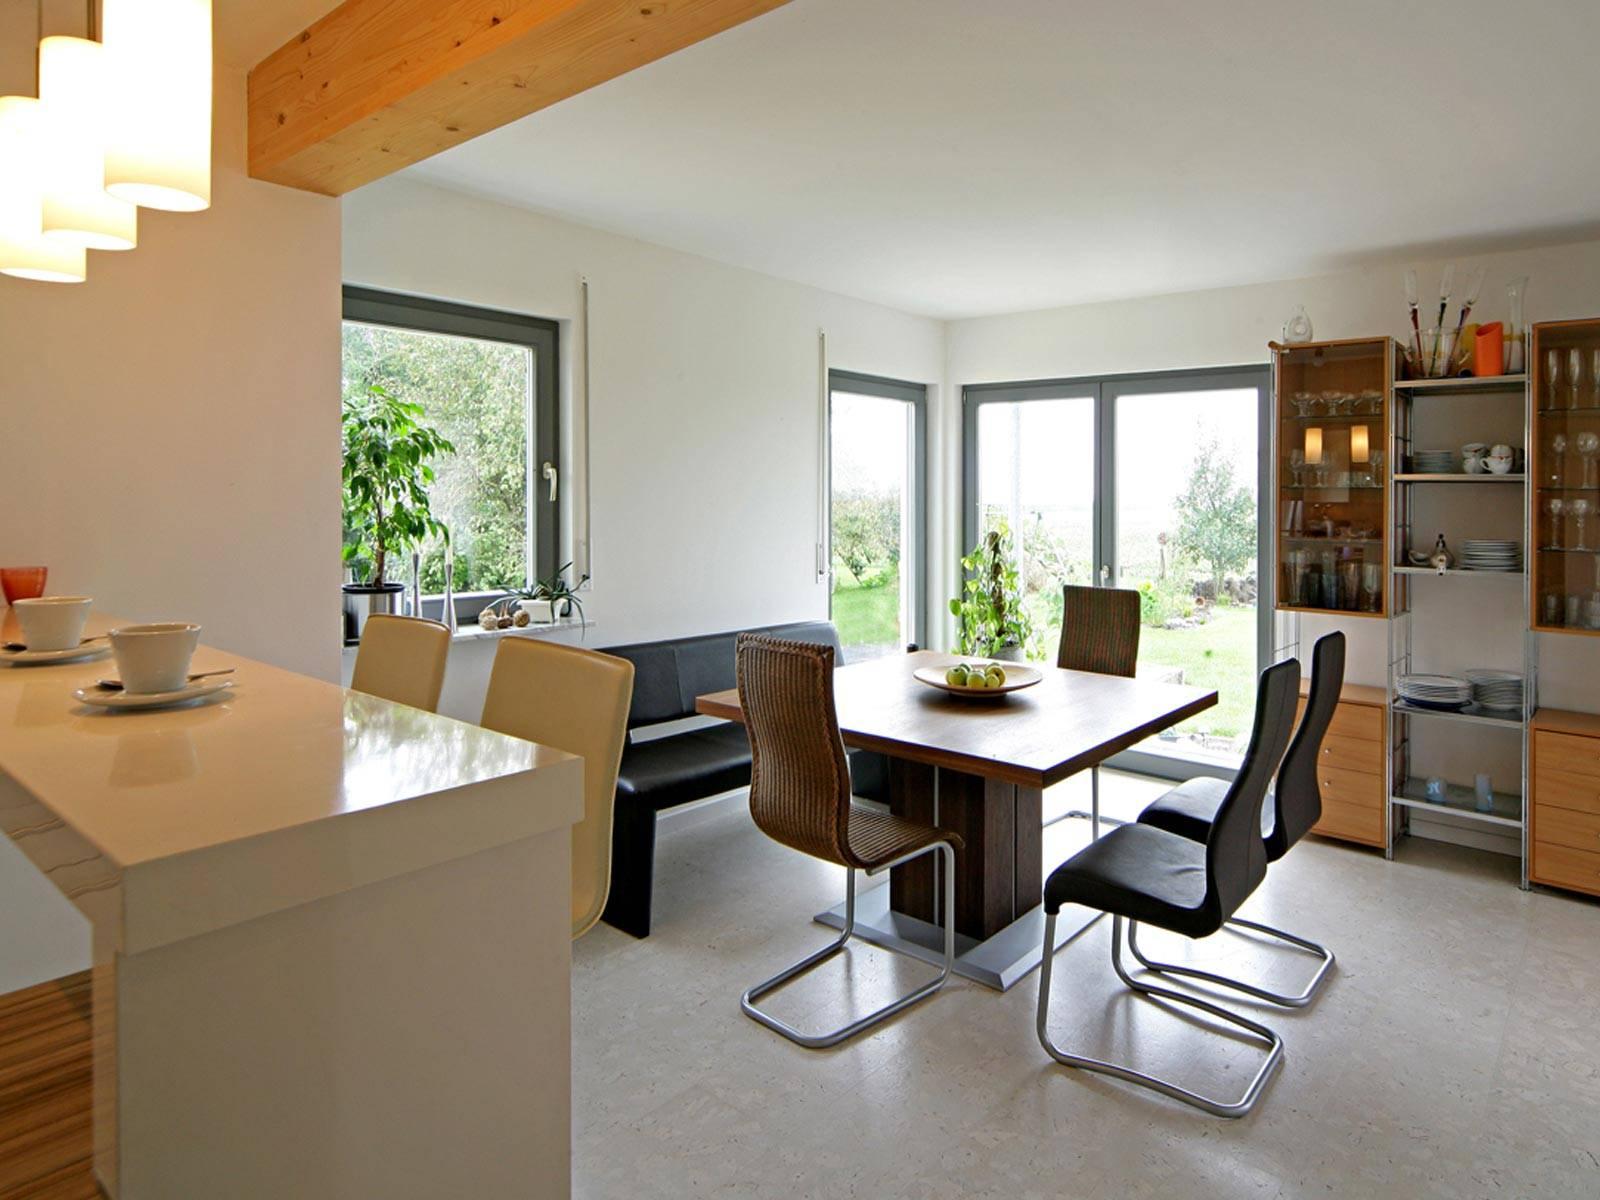 pultdachhaus k gler fertighaus weiss. Black Bedroom Furniture Sets. Home Design Ideas